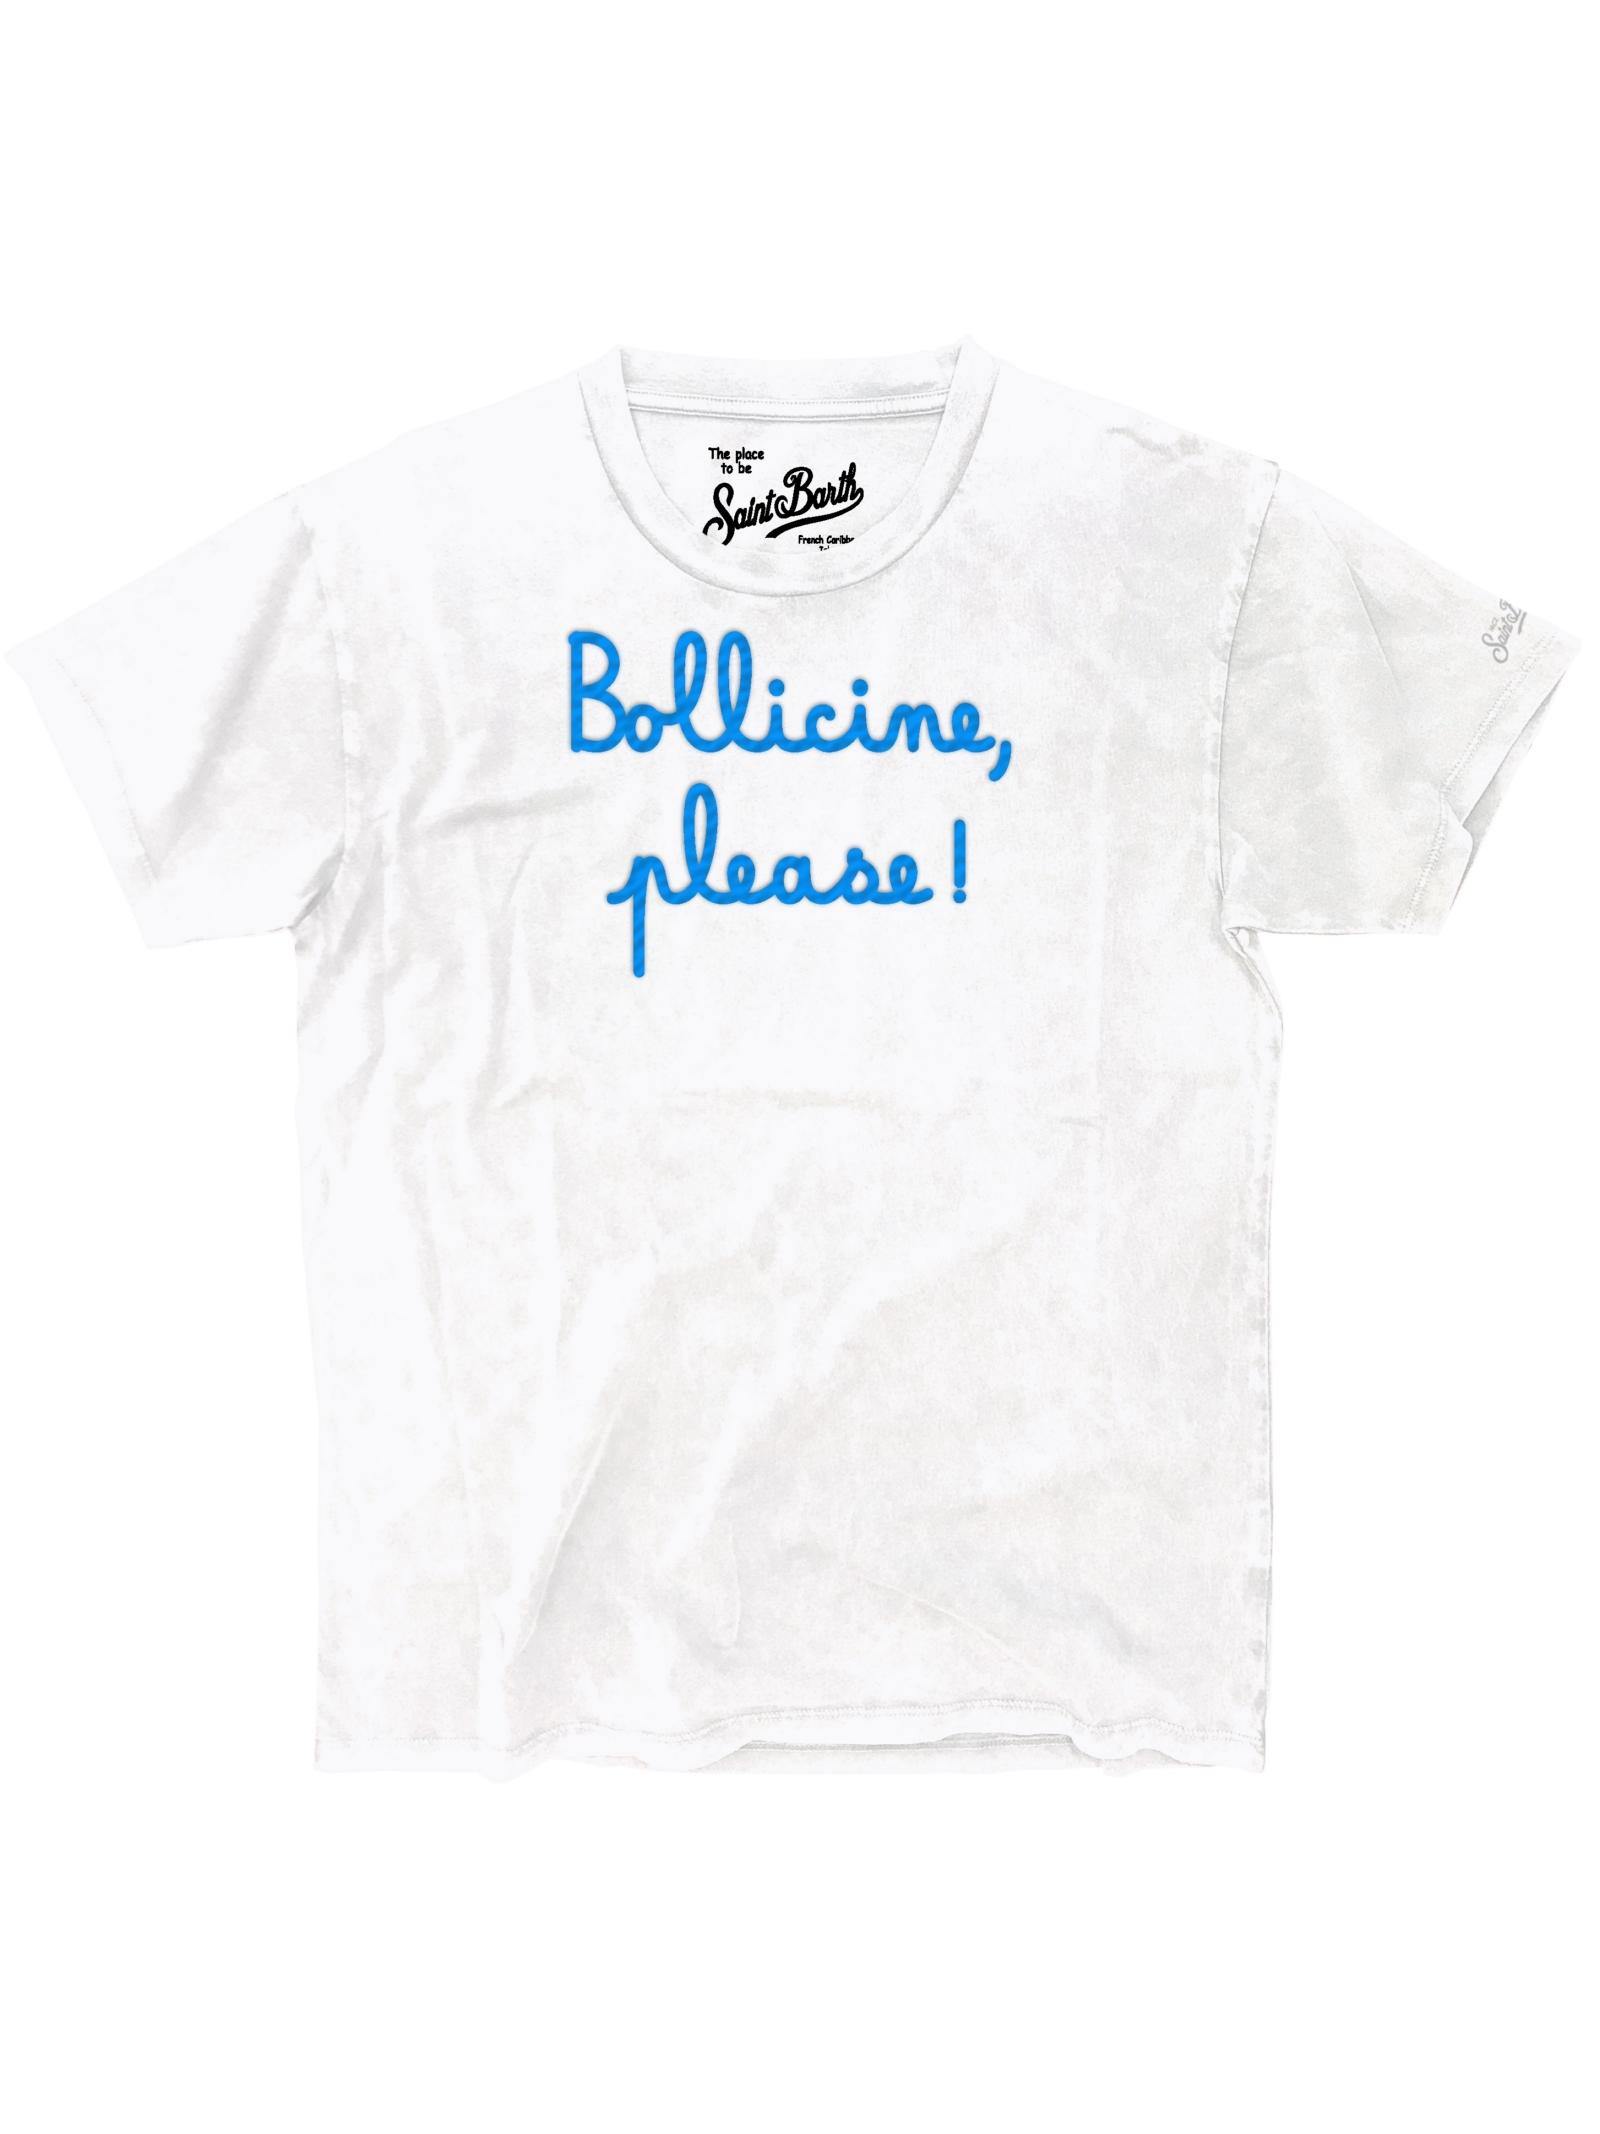 emilie t-shirt MC2 Saint Barth | T-shirt | EMI0001EBIP01